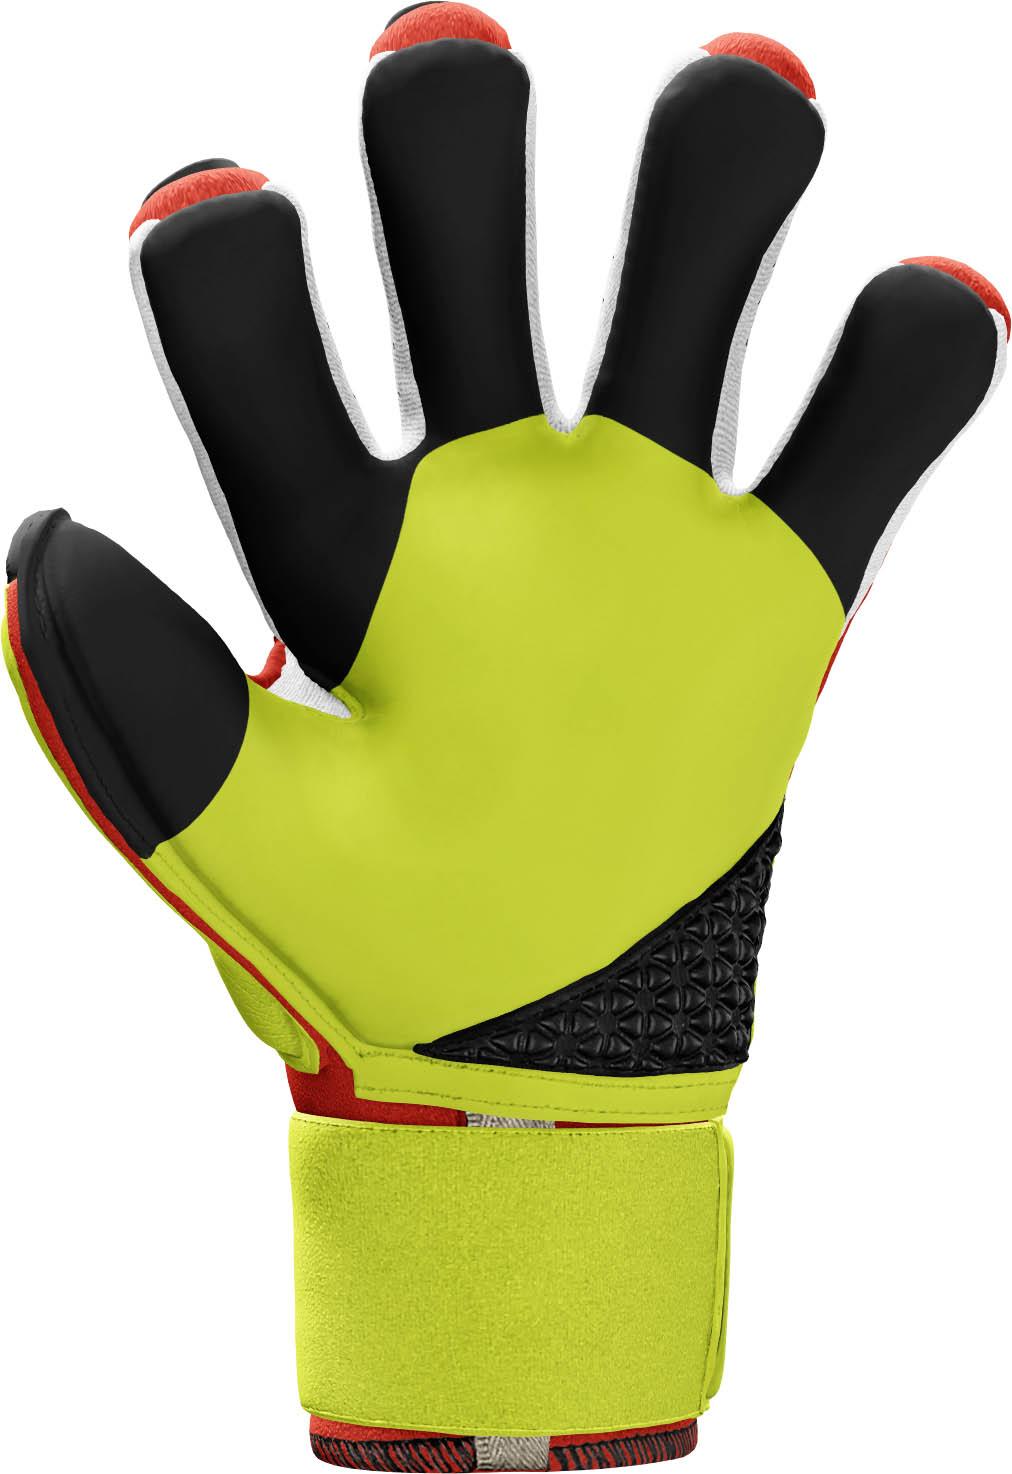 Adidas ACE Zones Finger Tip Goalkeeper Gloves (Solar ... |Goalkeeper Gloves Adidas 2015